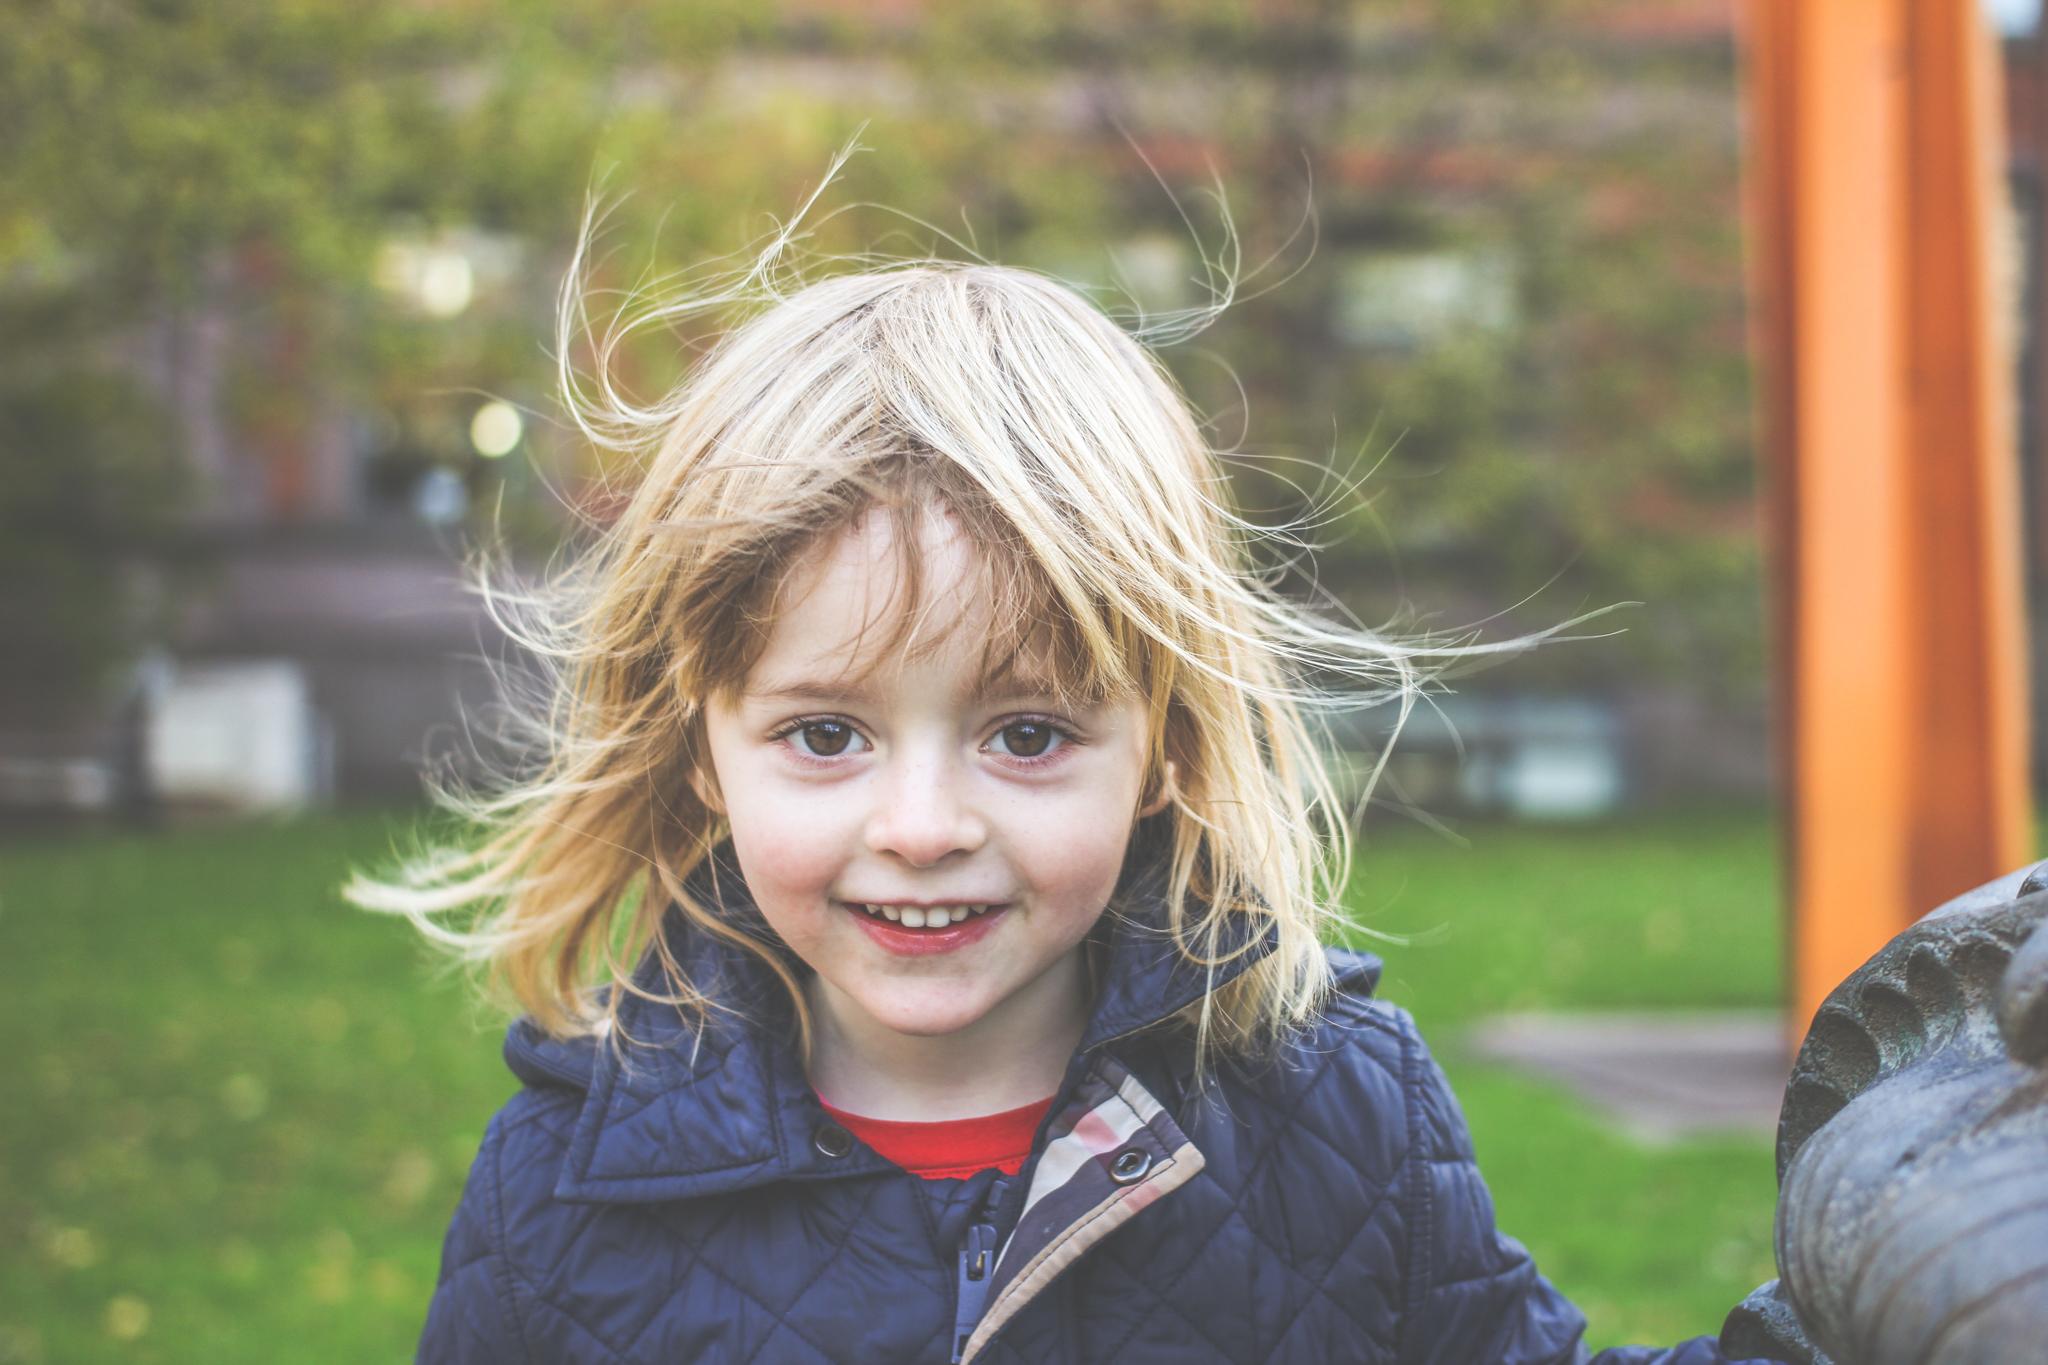 SarahShalenePhotography_Pia-1.jpg